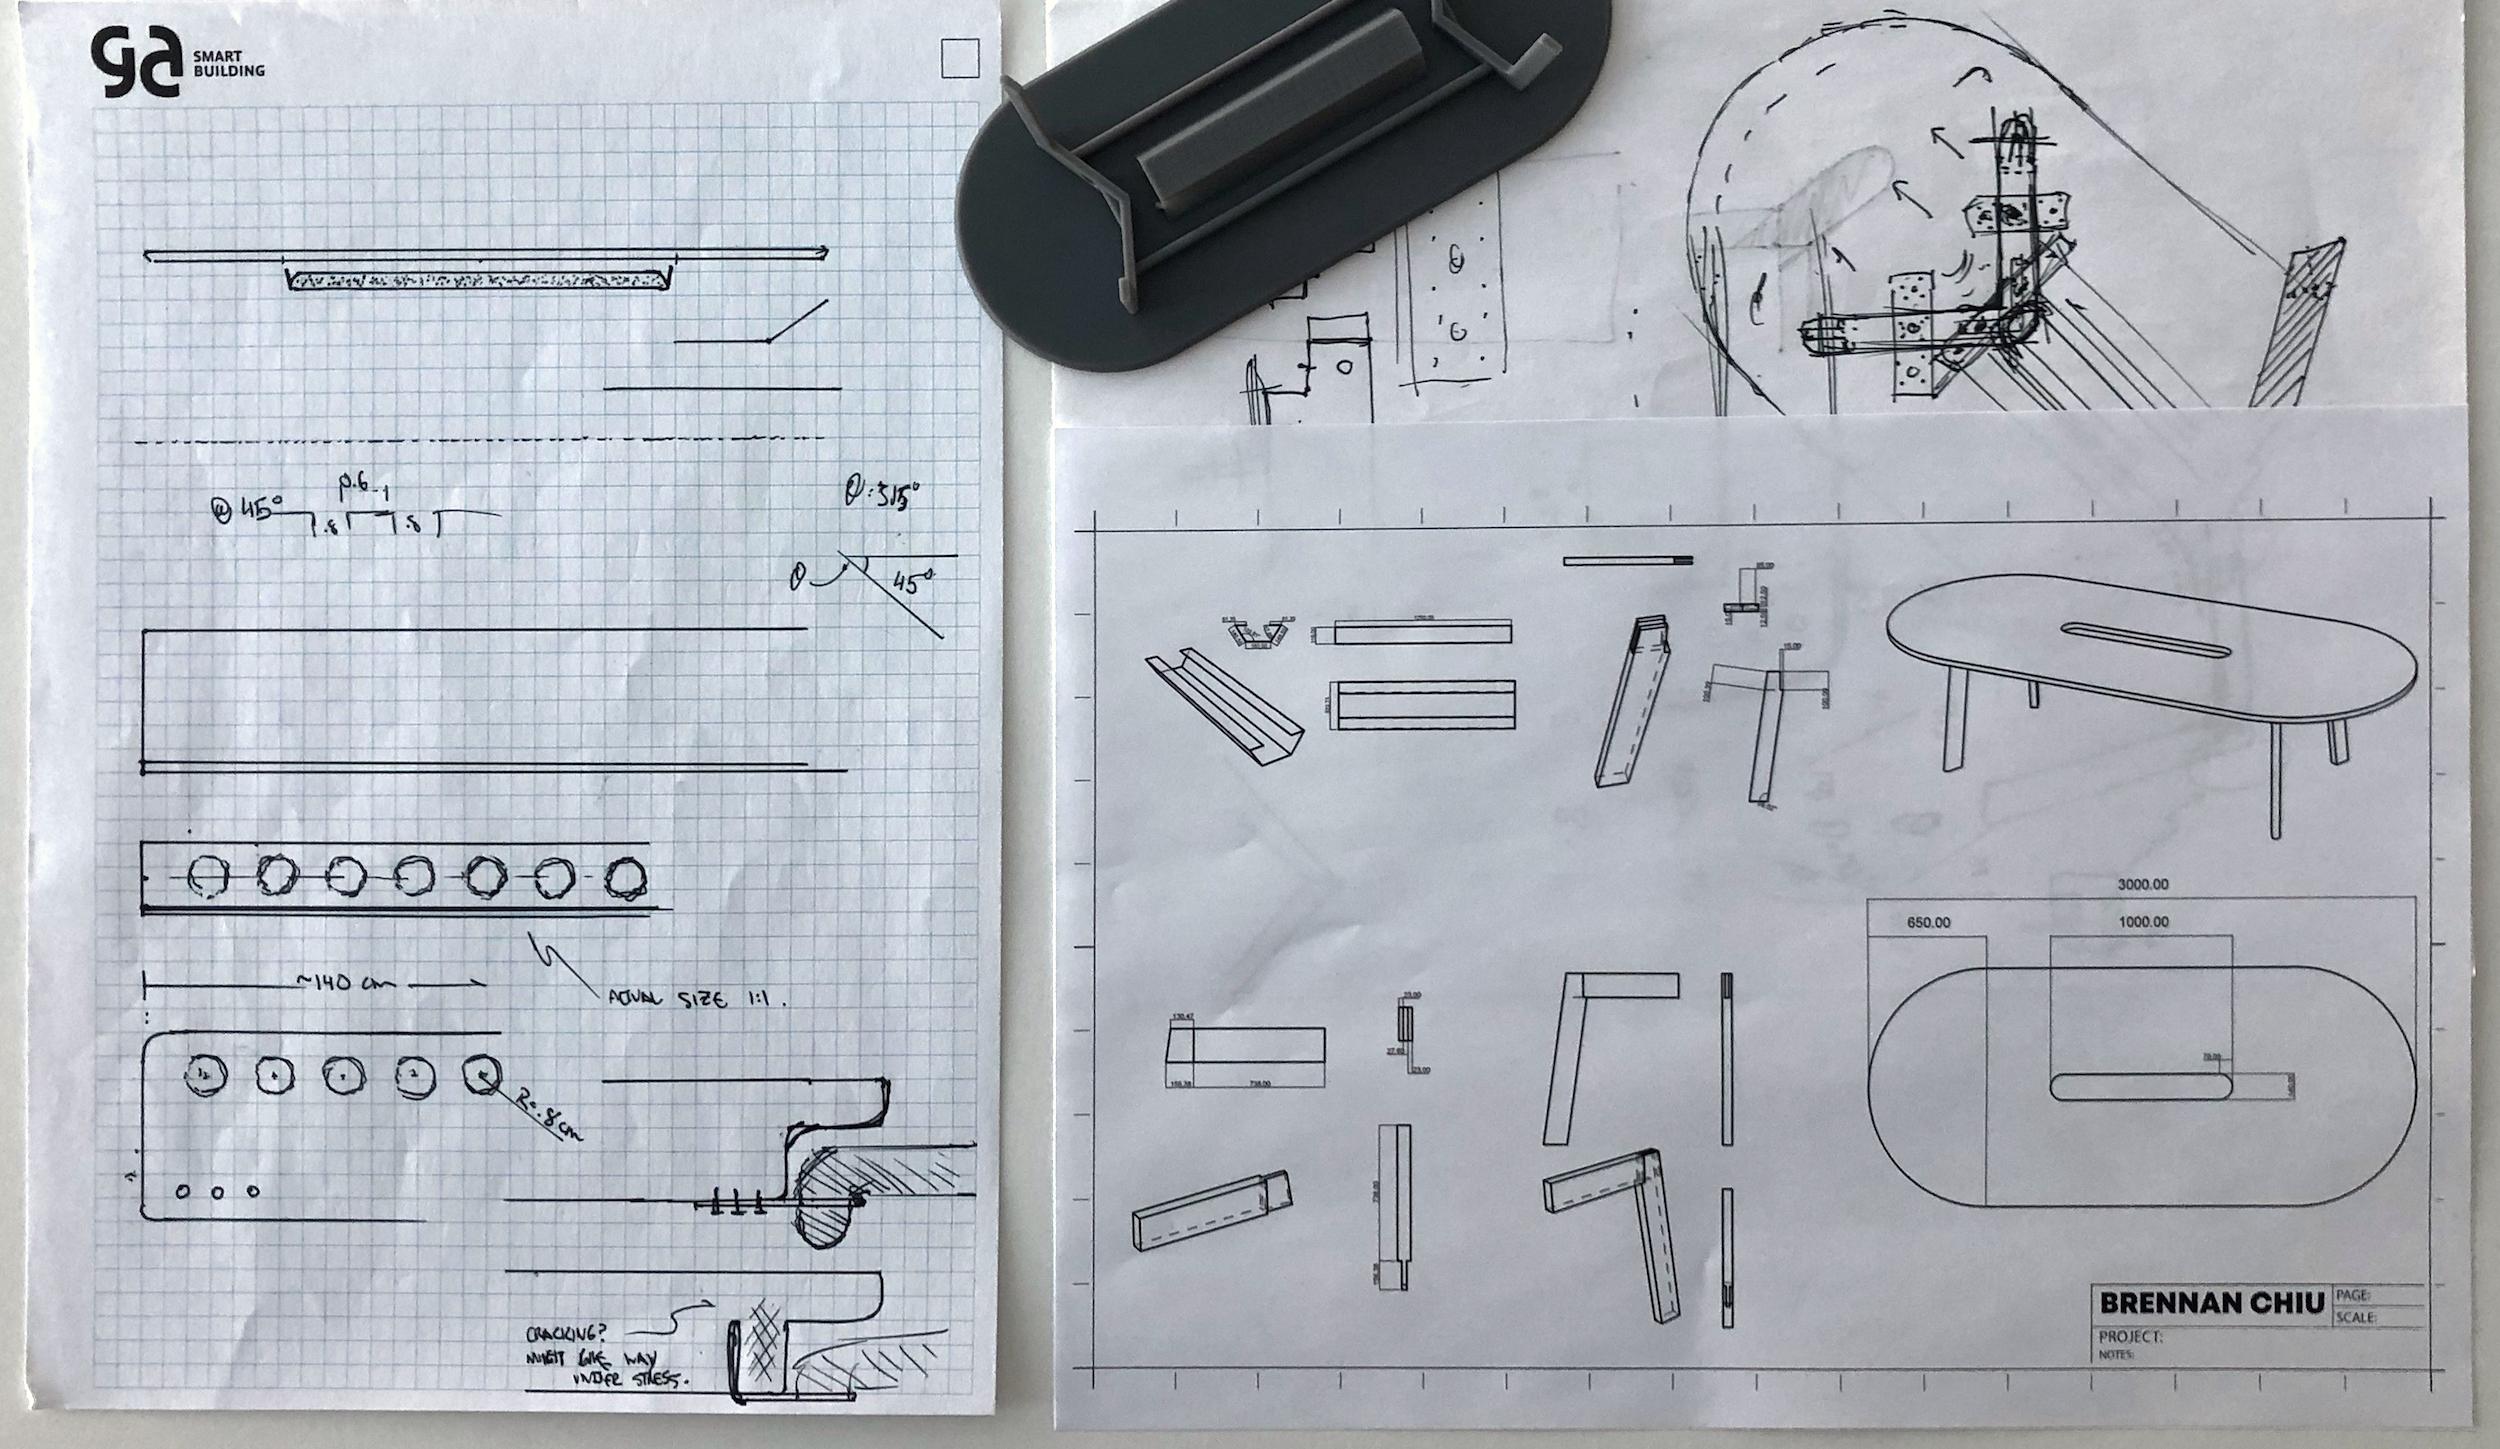 Brennan-Chiu_Industrial-Design_Design-Studio-Table_Tech.JPG